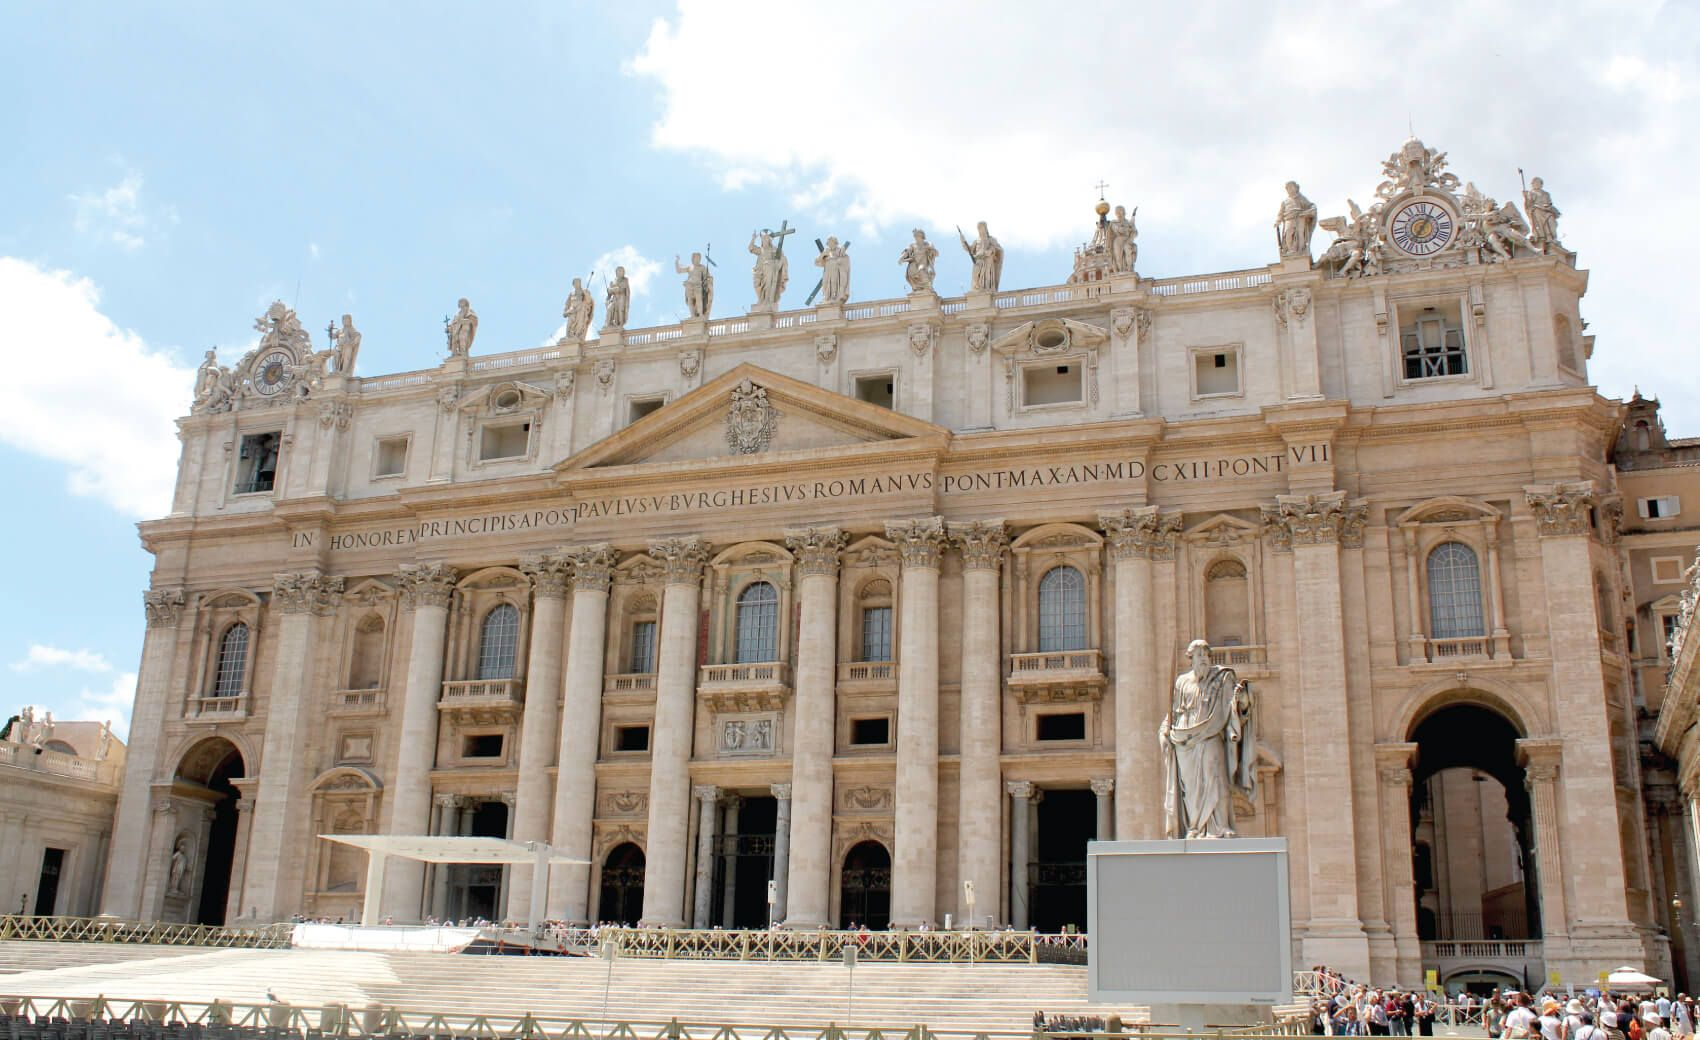 Sistine Chapel Entrance